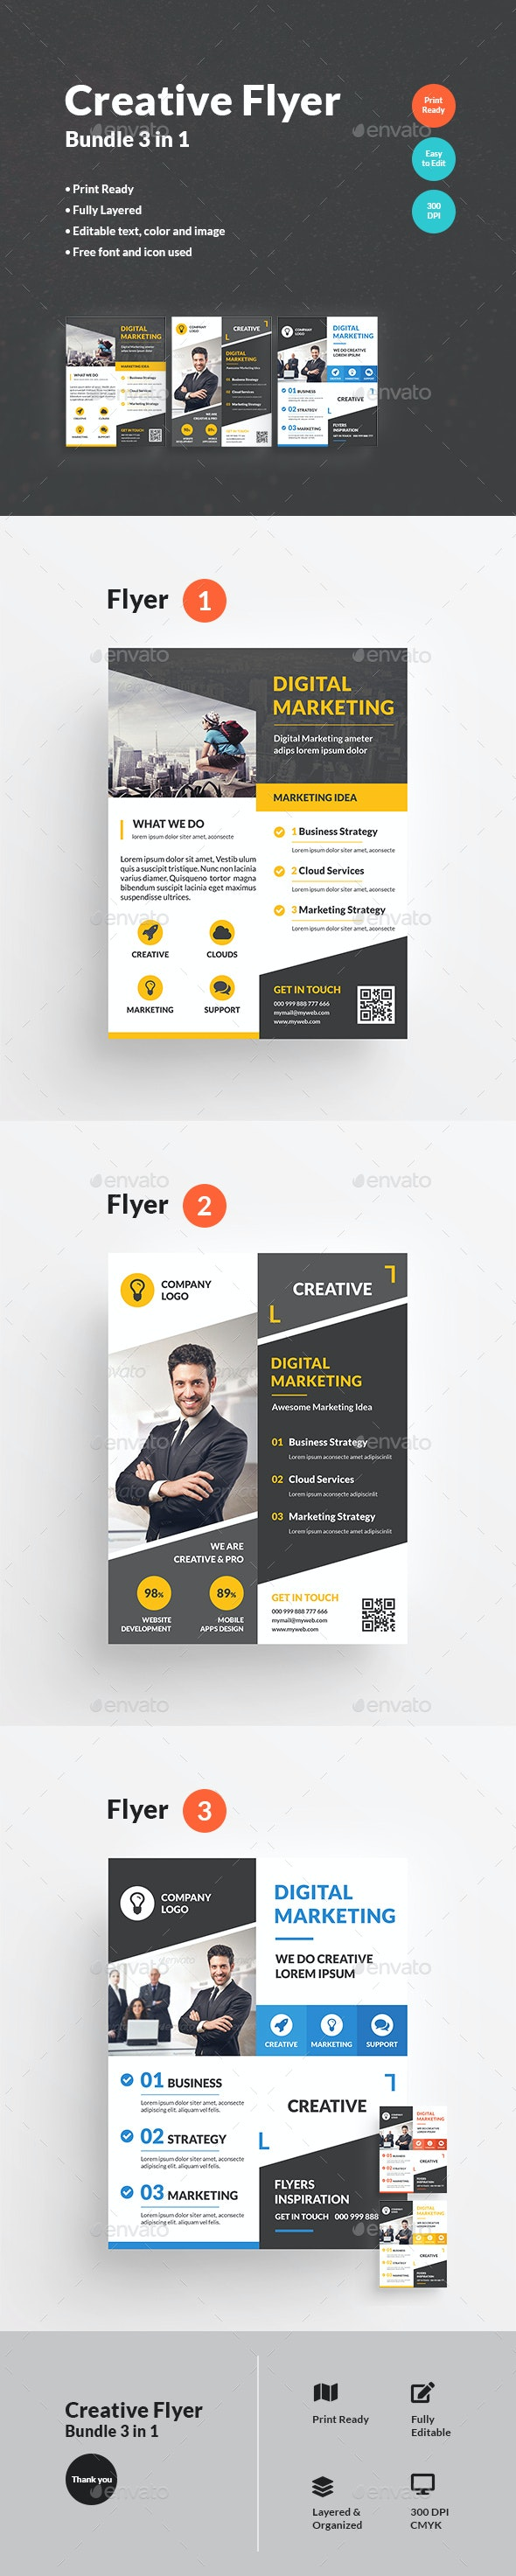 Creative Flyer Bundle 3 in 1 - Corporate Flyers